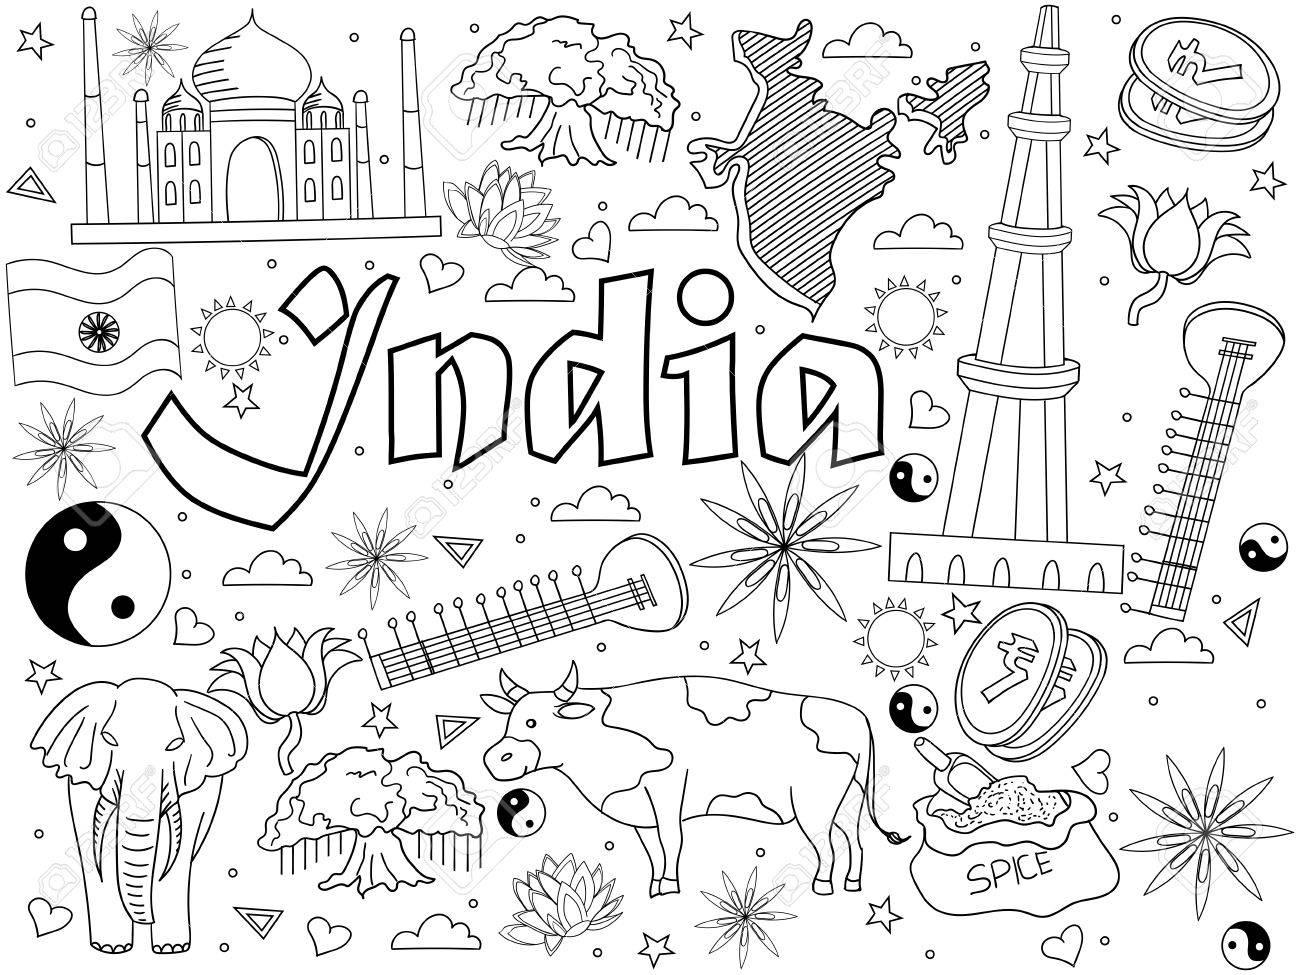 India Coloring Book Line Art Design Vector Illustration. Separate ...